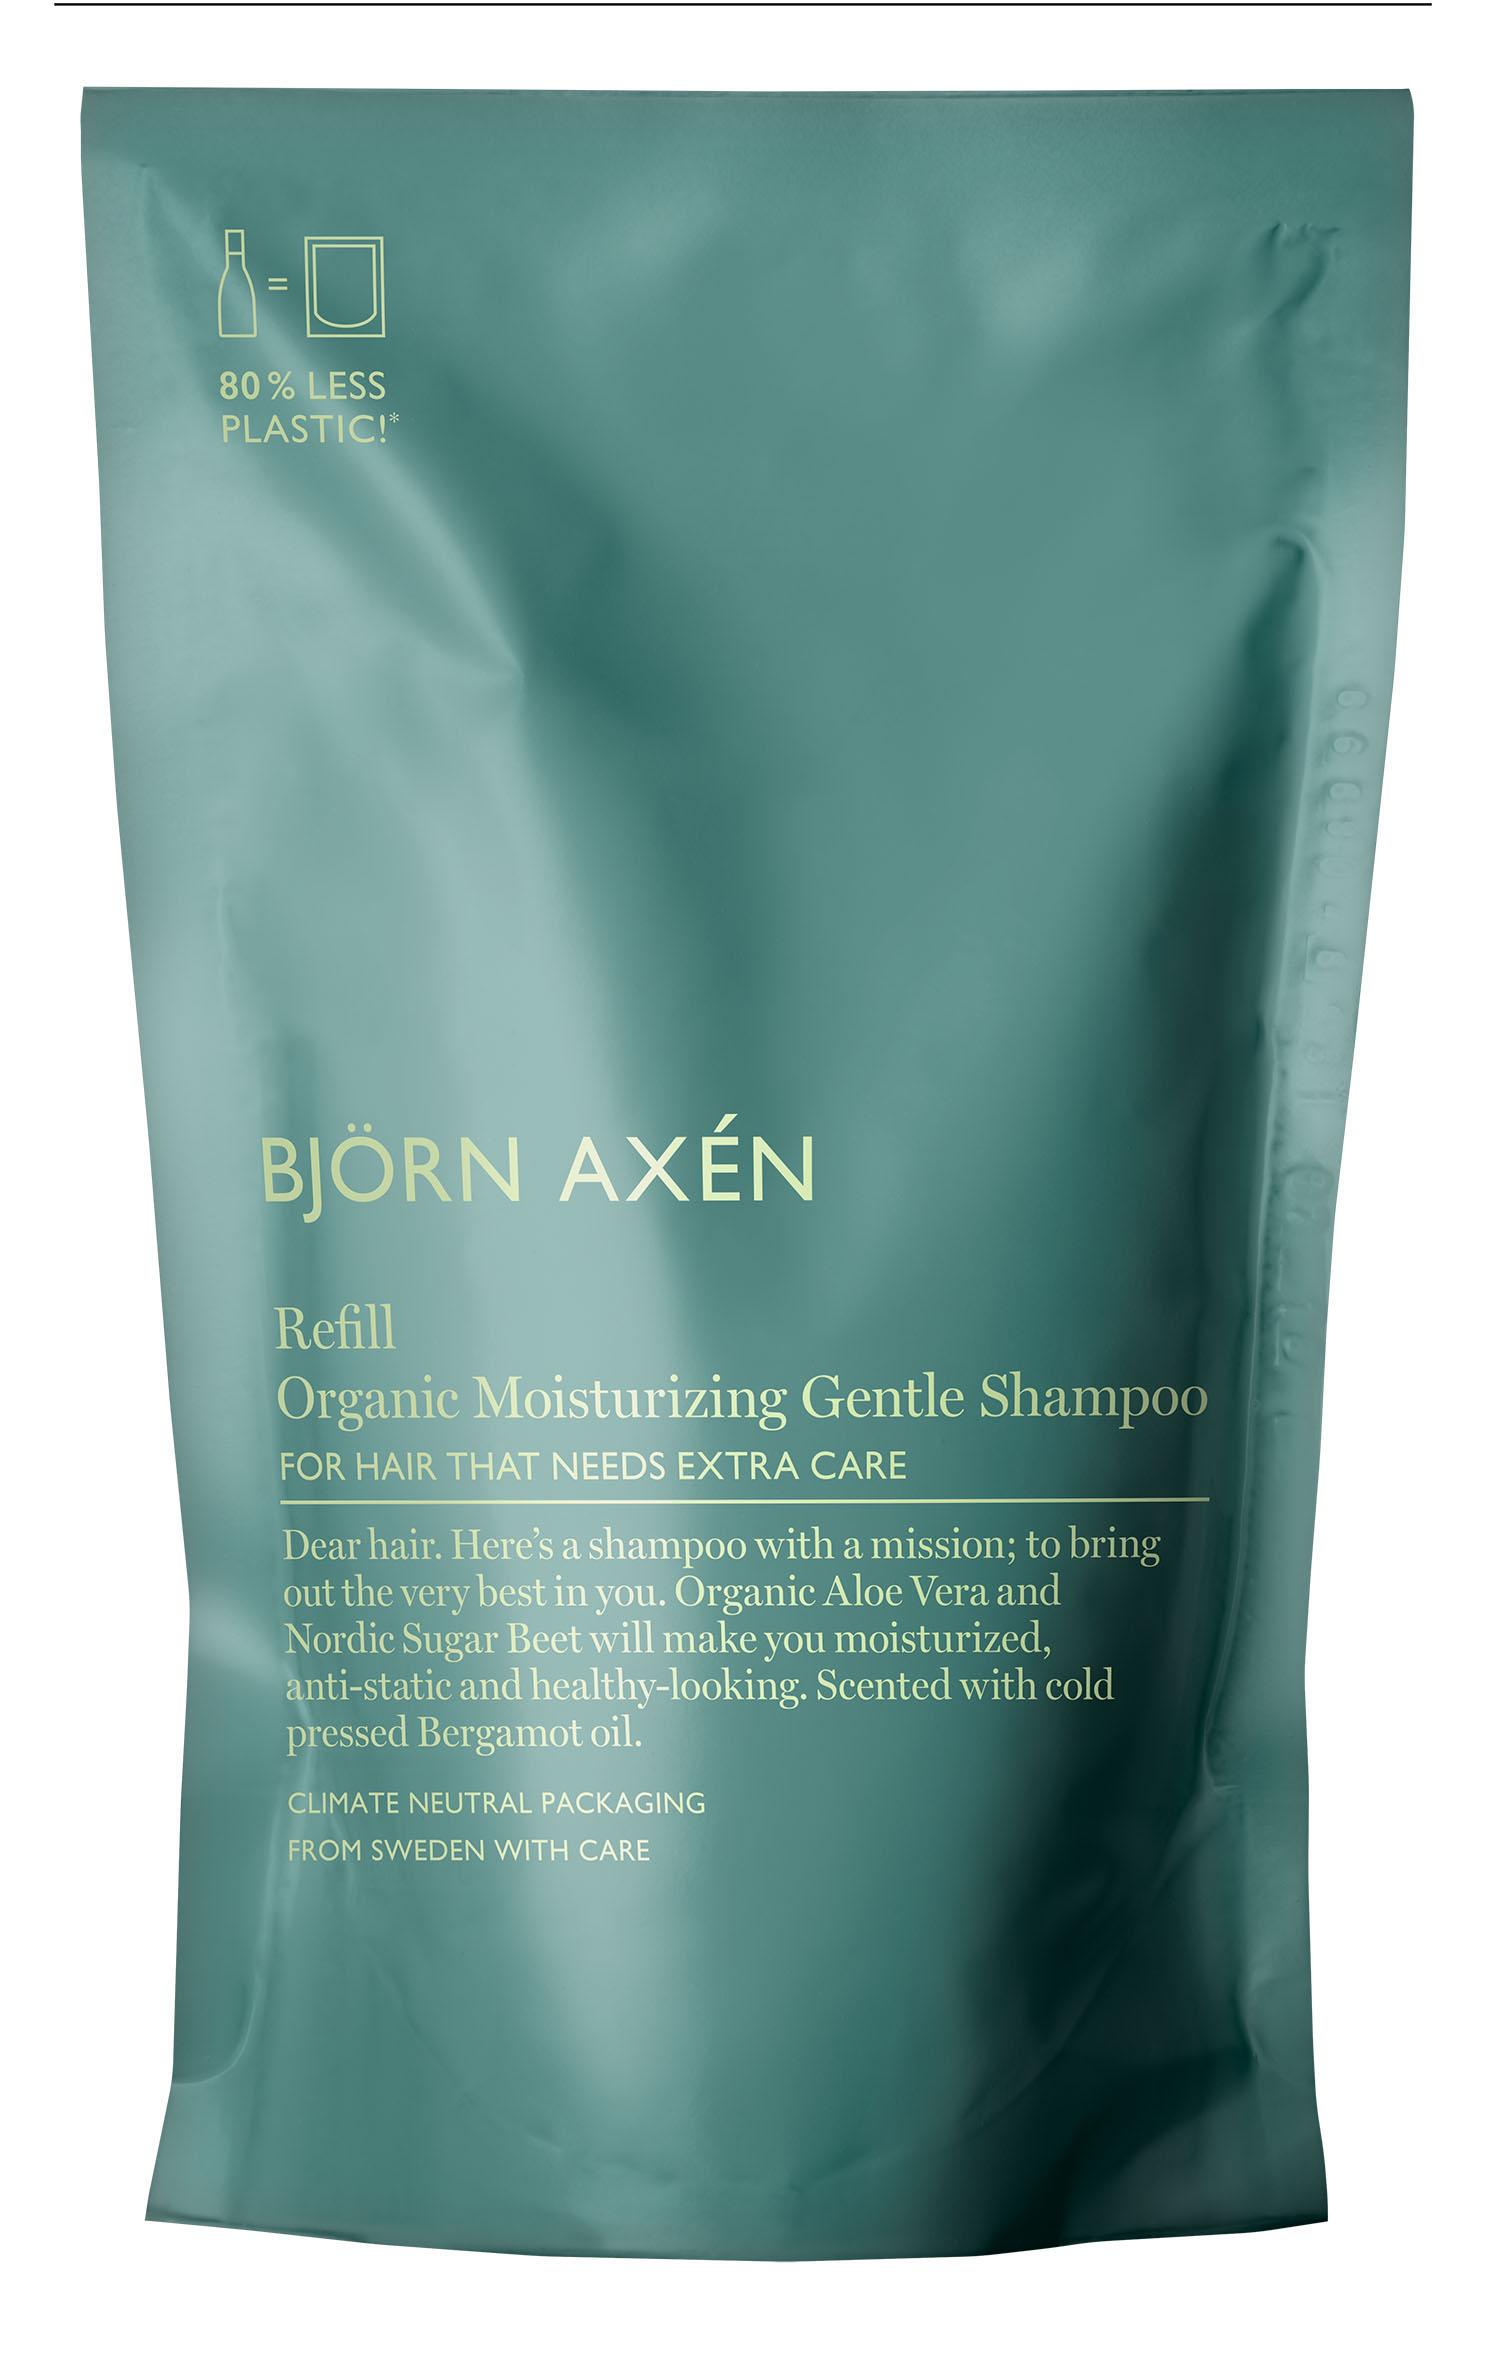 Refill Organic Moisturizing Gentle Shampoo